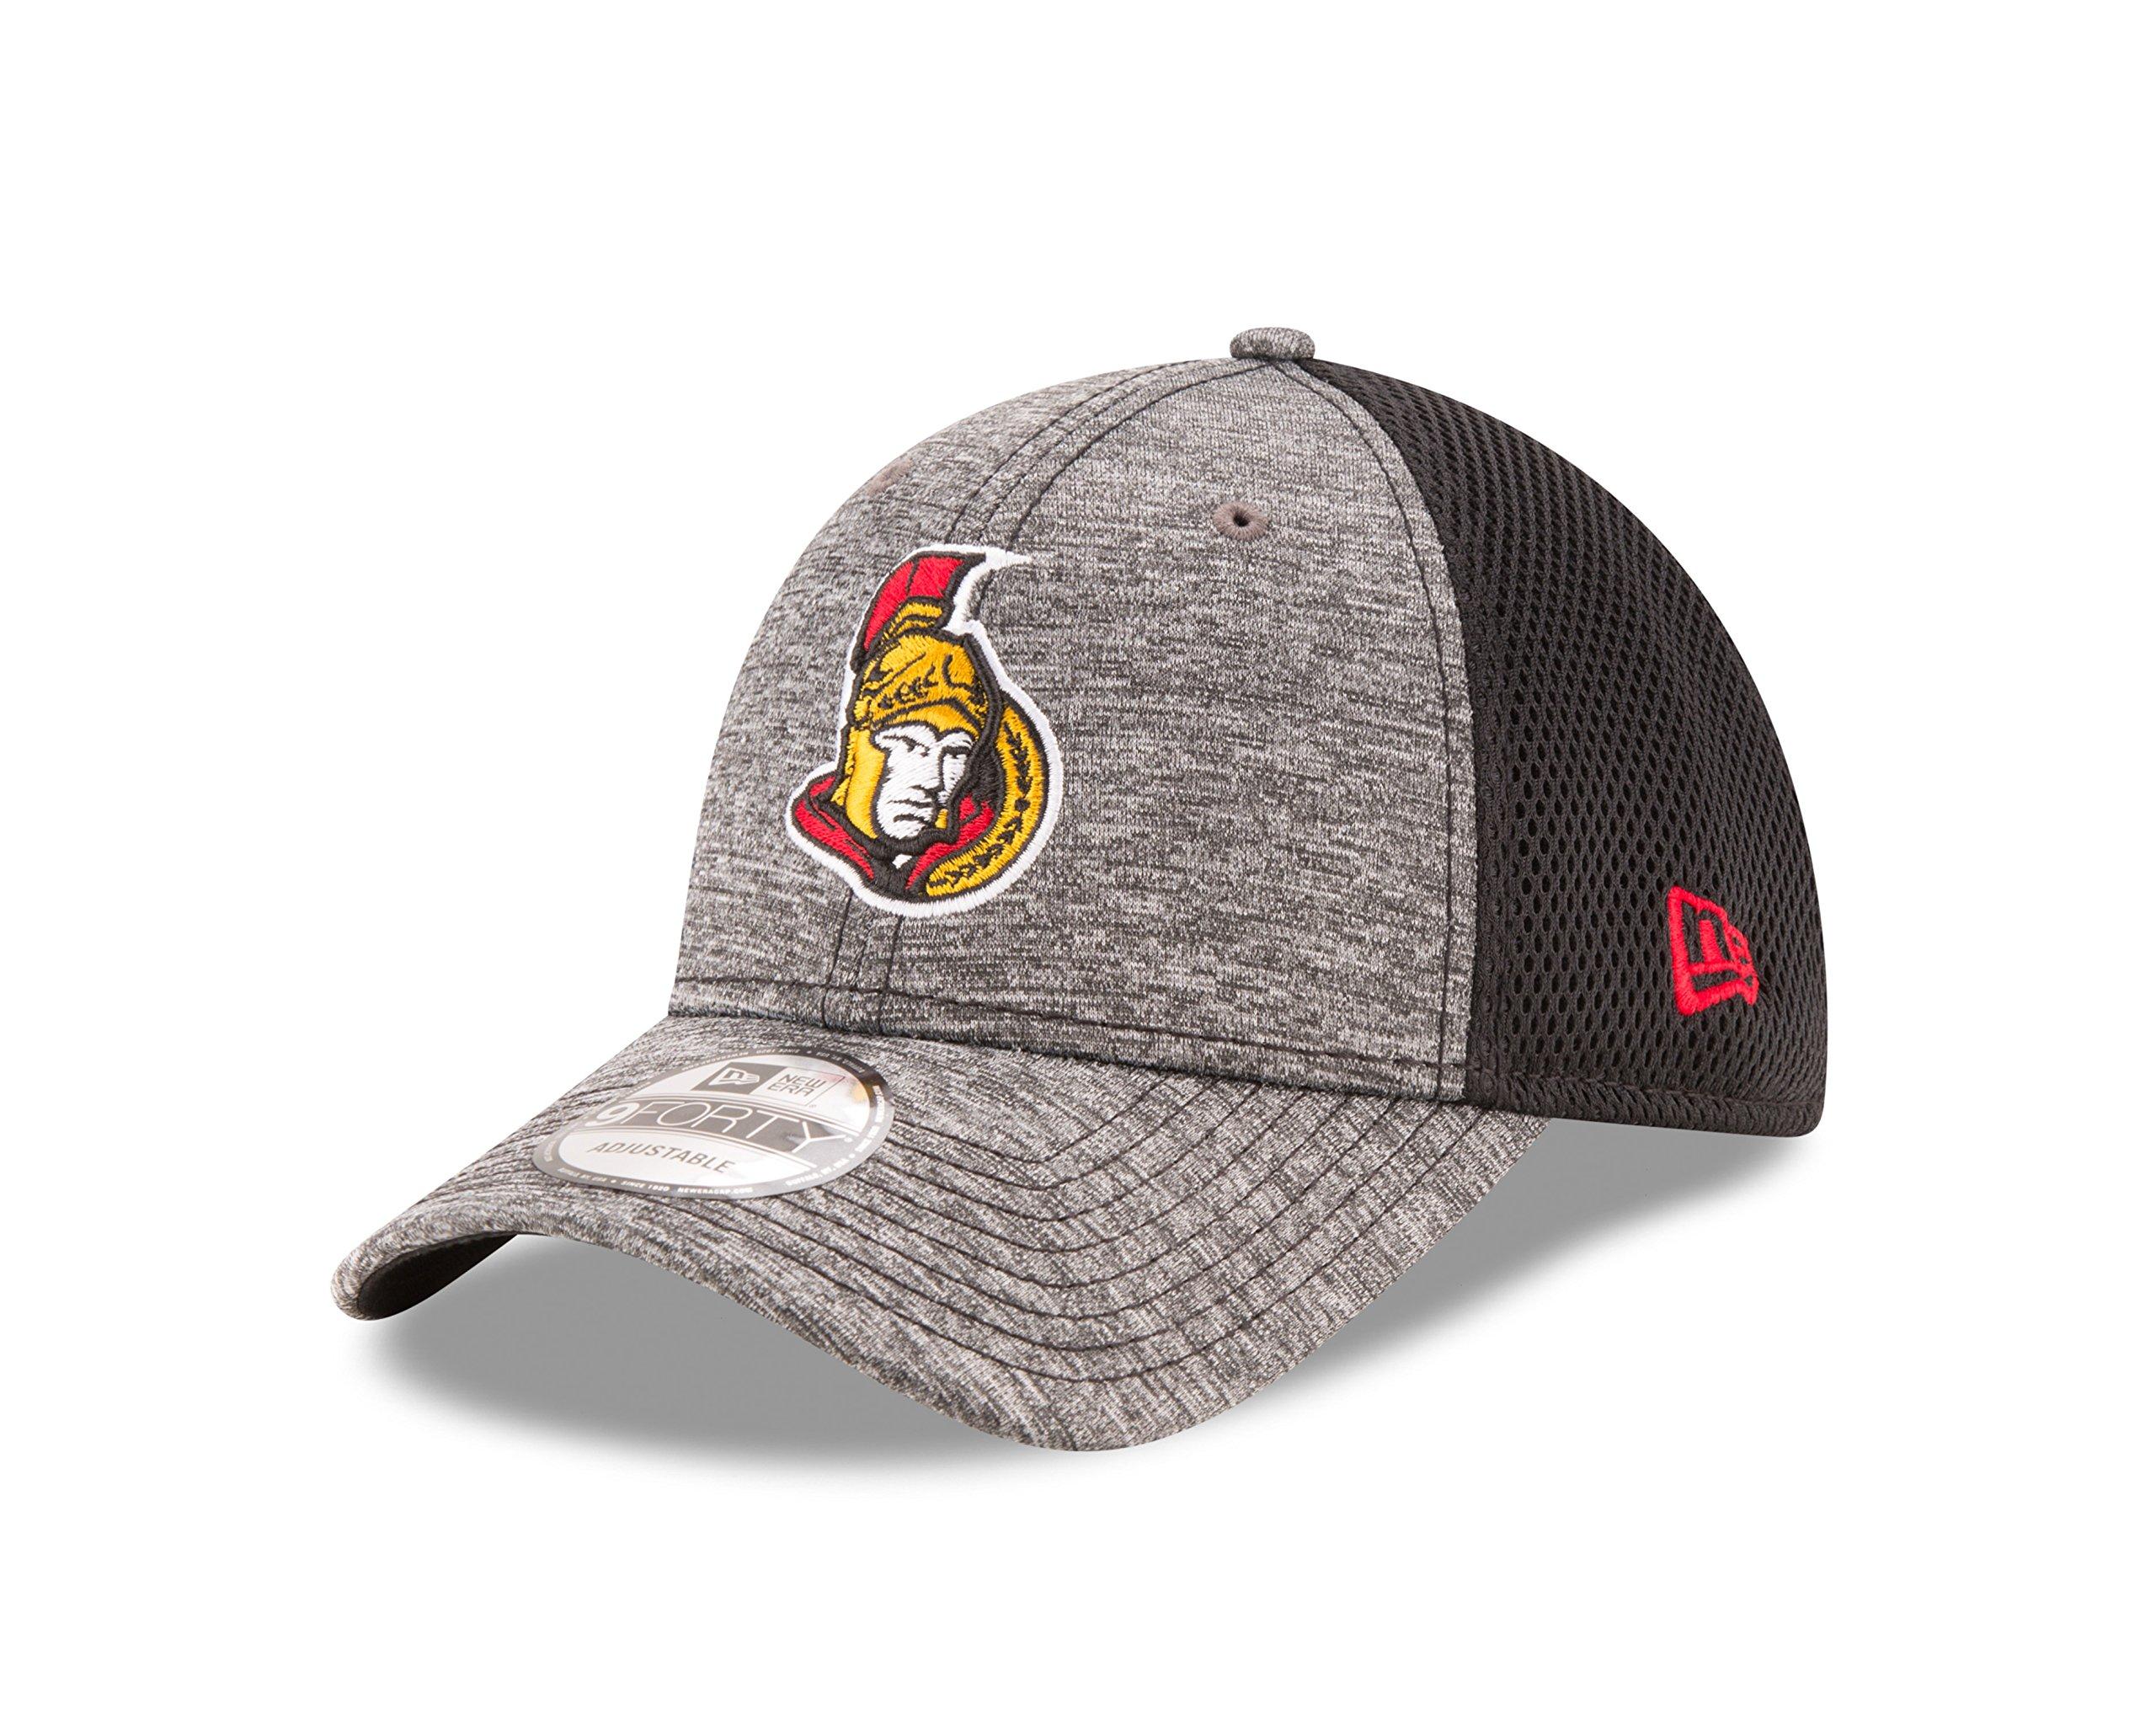 quality design e399e 2a2e5 wholesale hockey hat ottawa senators nhl hockey cap flexfit sizing  623575159630 38360 1000x1000 ca898 eb9b6  germany new era nhl adult shadow  turn 9forty ...